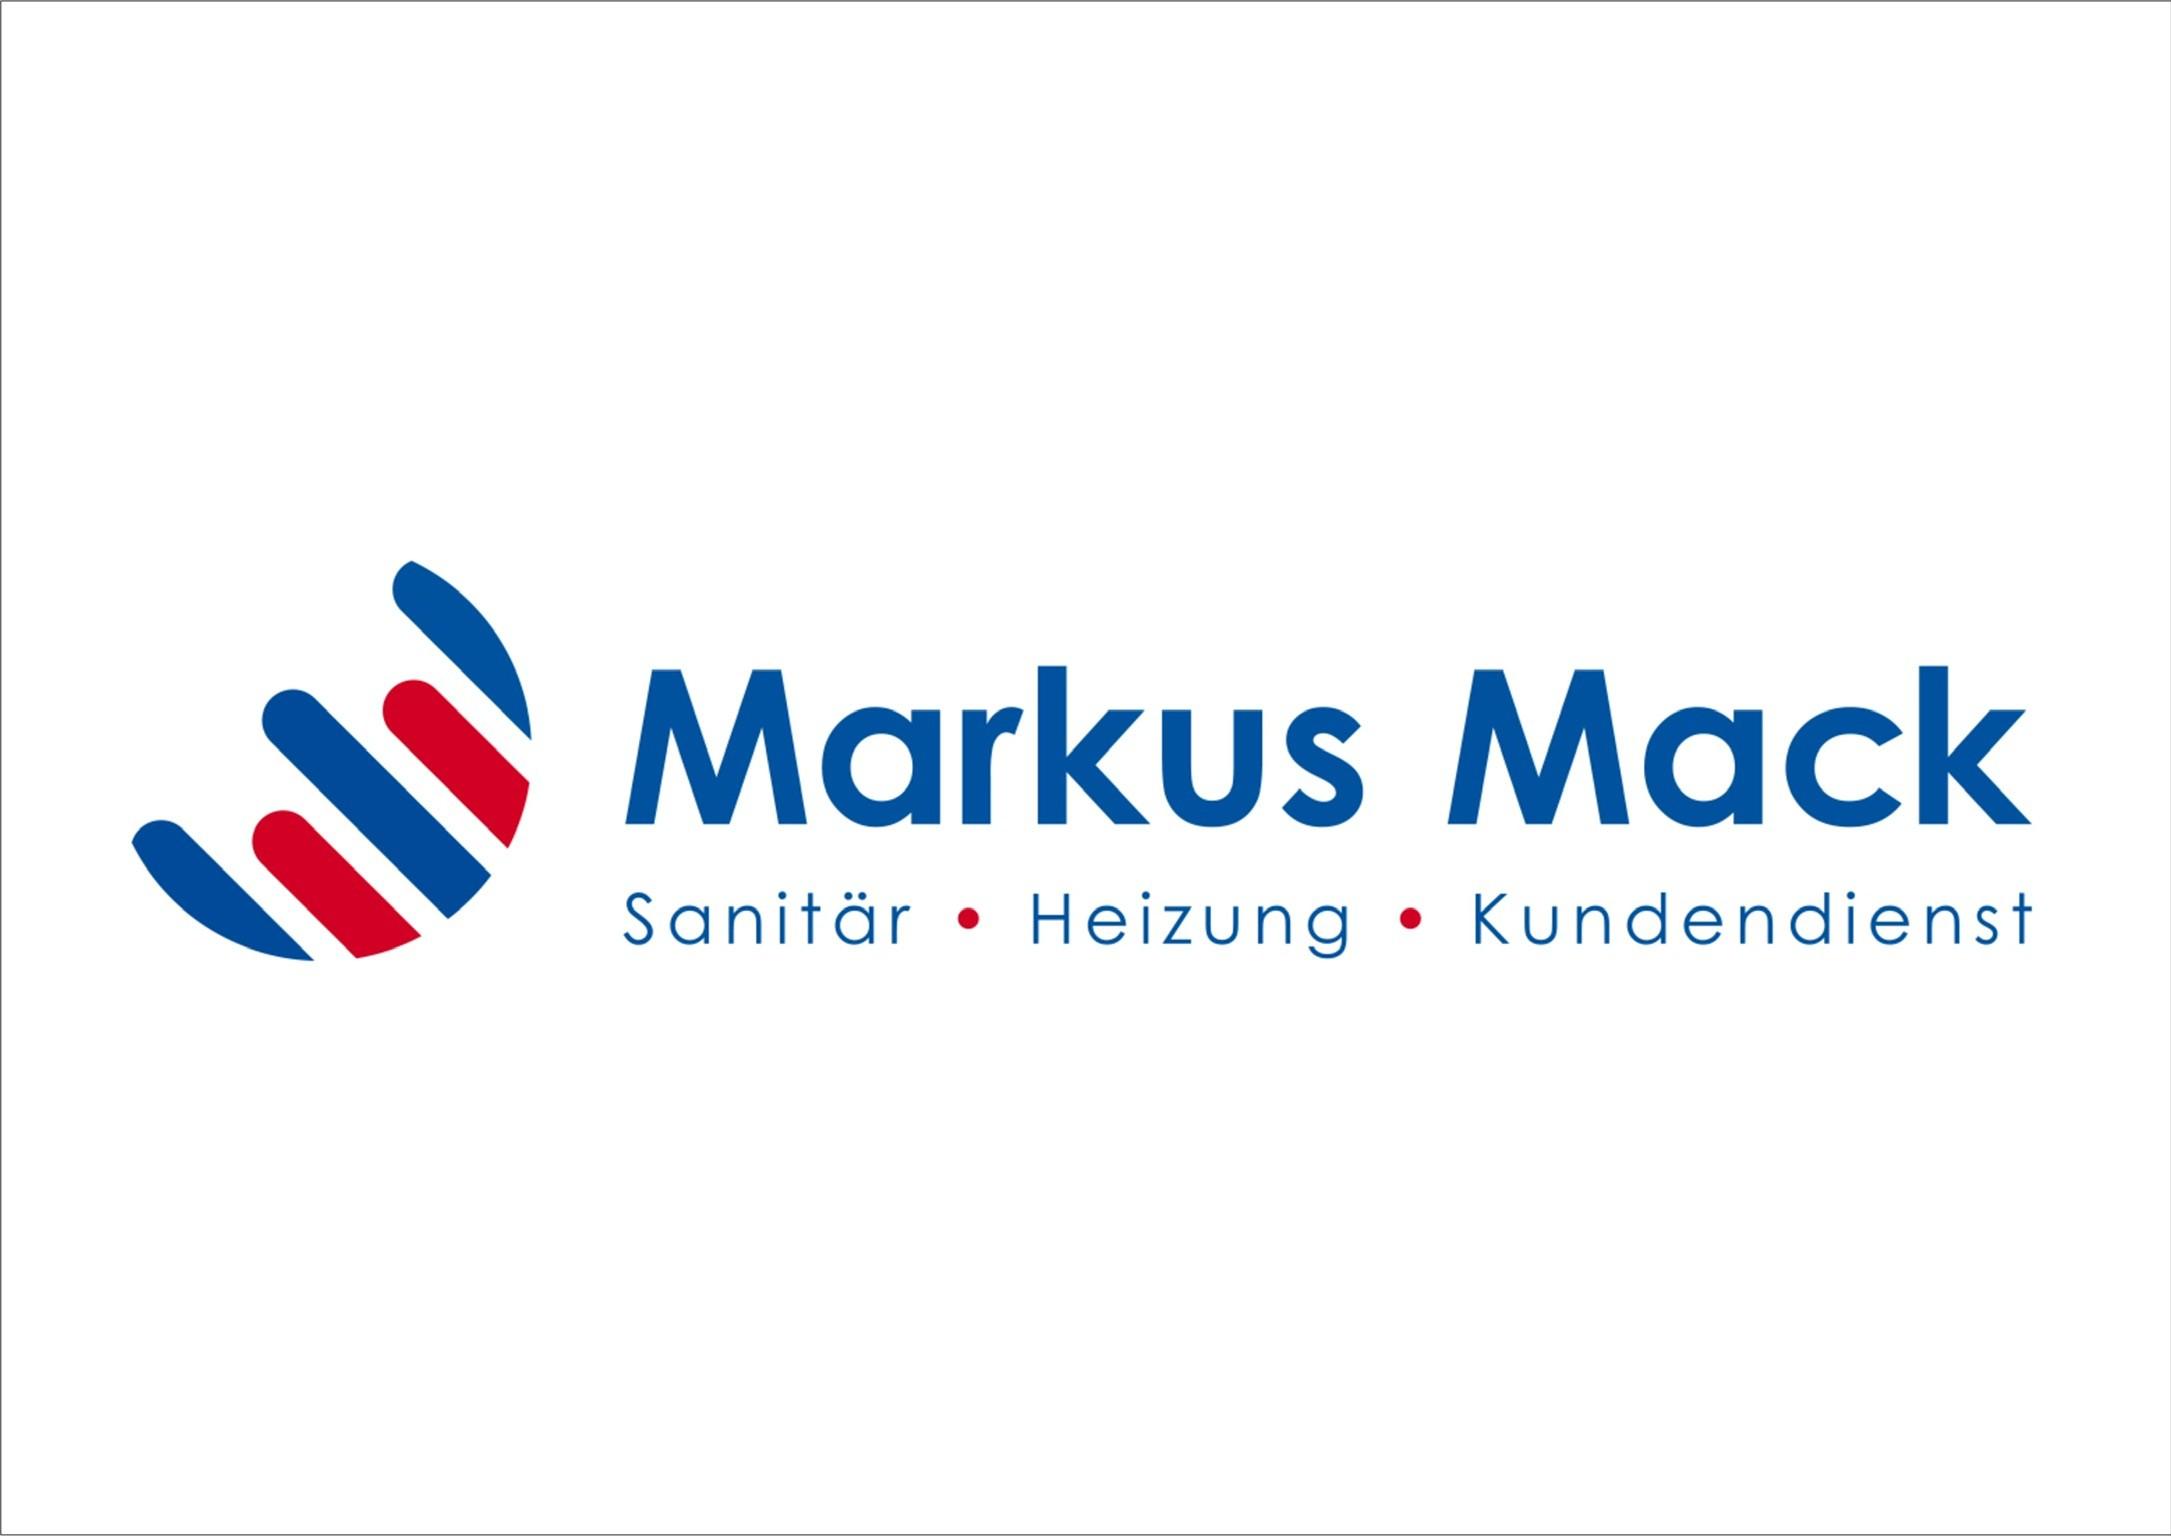 Logo der Firma: Markus Mack Heizung Sanitär